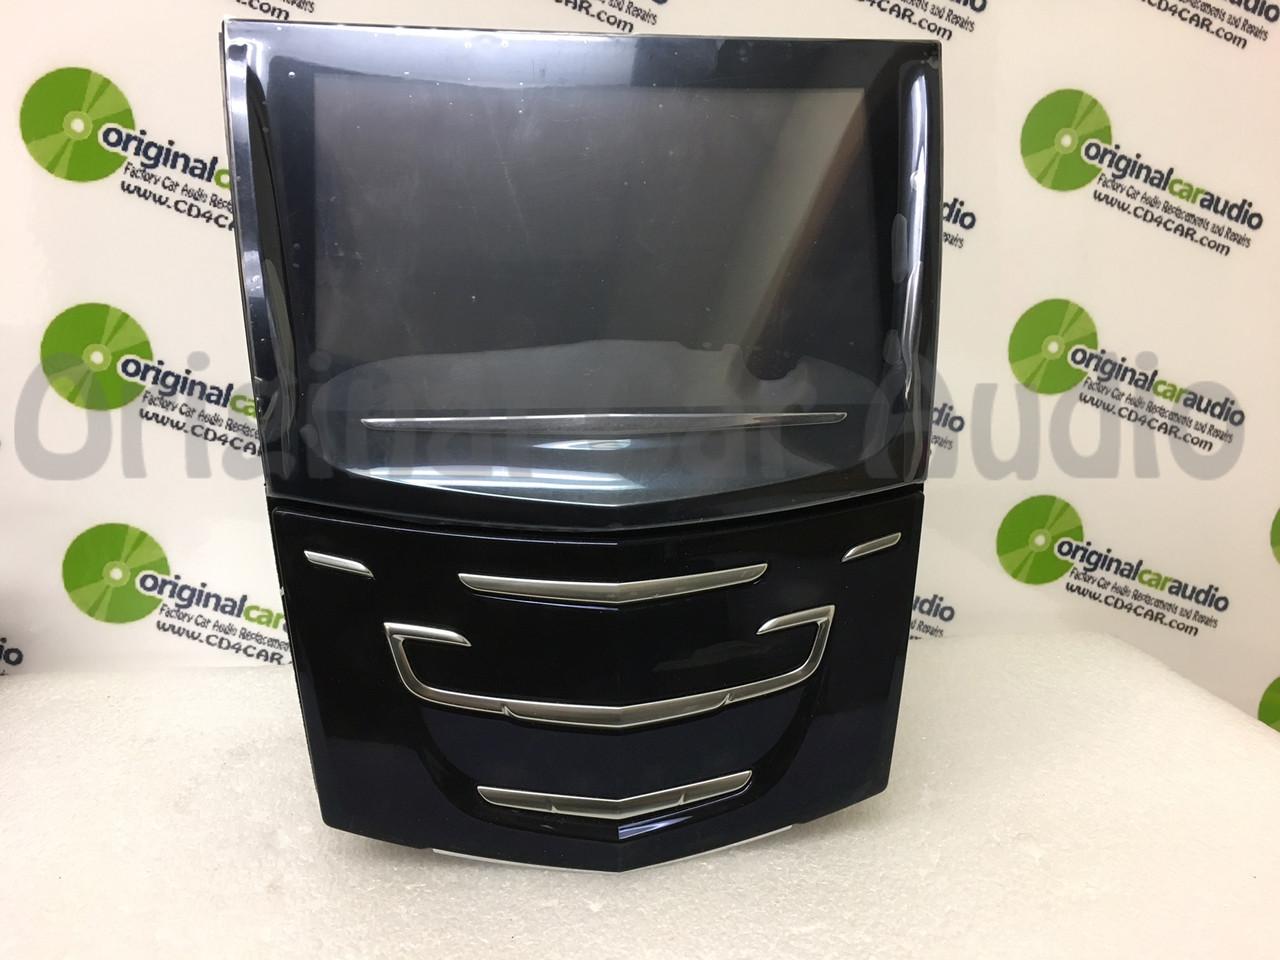 2013 Cadillac Ats For Sale >> REPAIR Cadillac CUE Navigation CUE Radio Nav Touch Screen Control Panel Radio | eBay